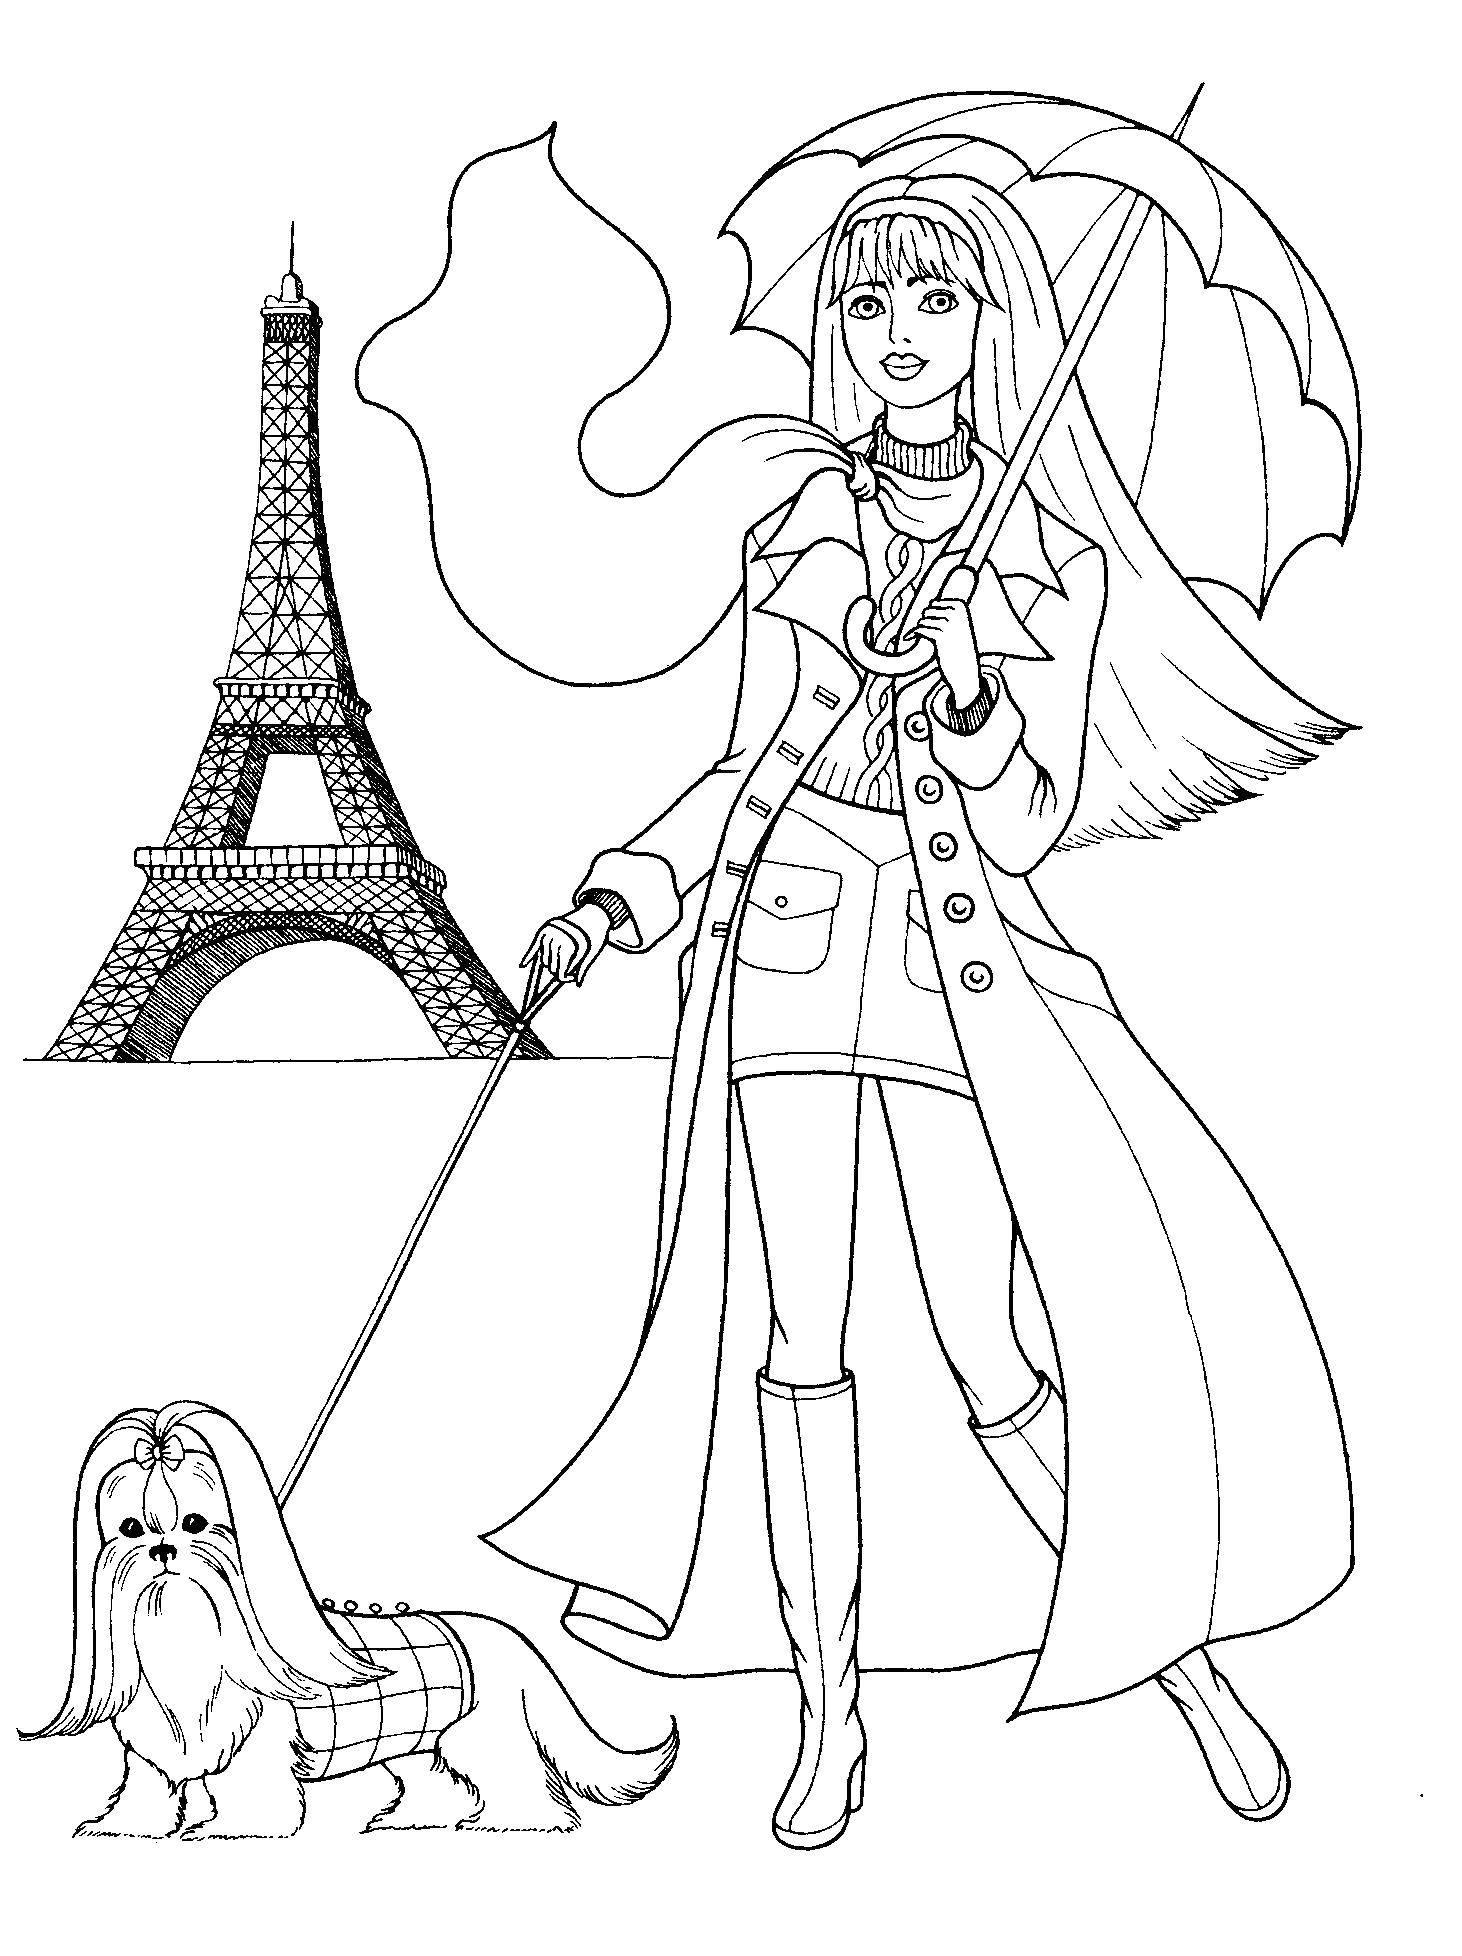 Раскраски барби, Раскраска Барби в париже с болонкой барби.